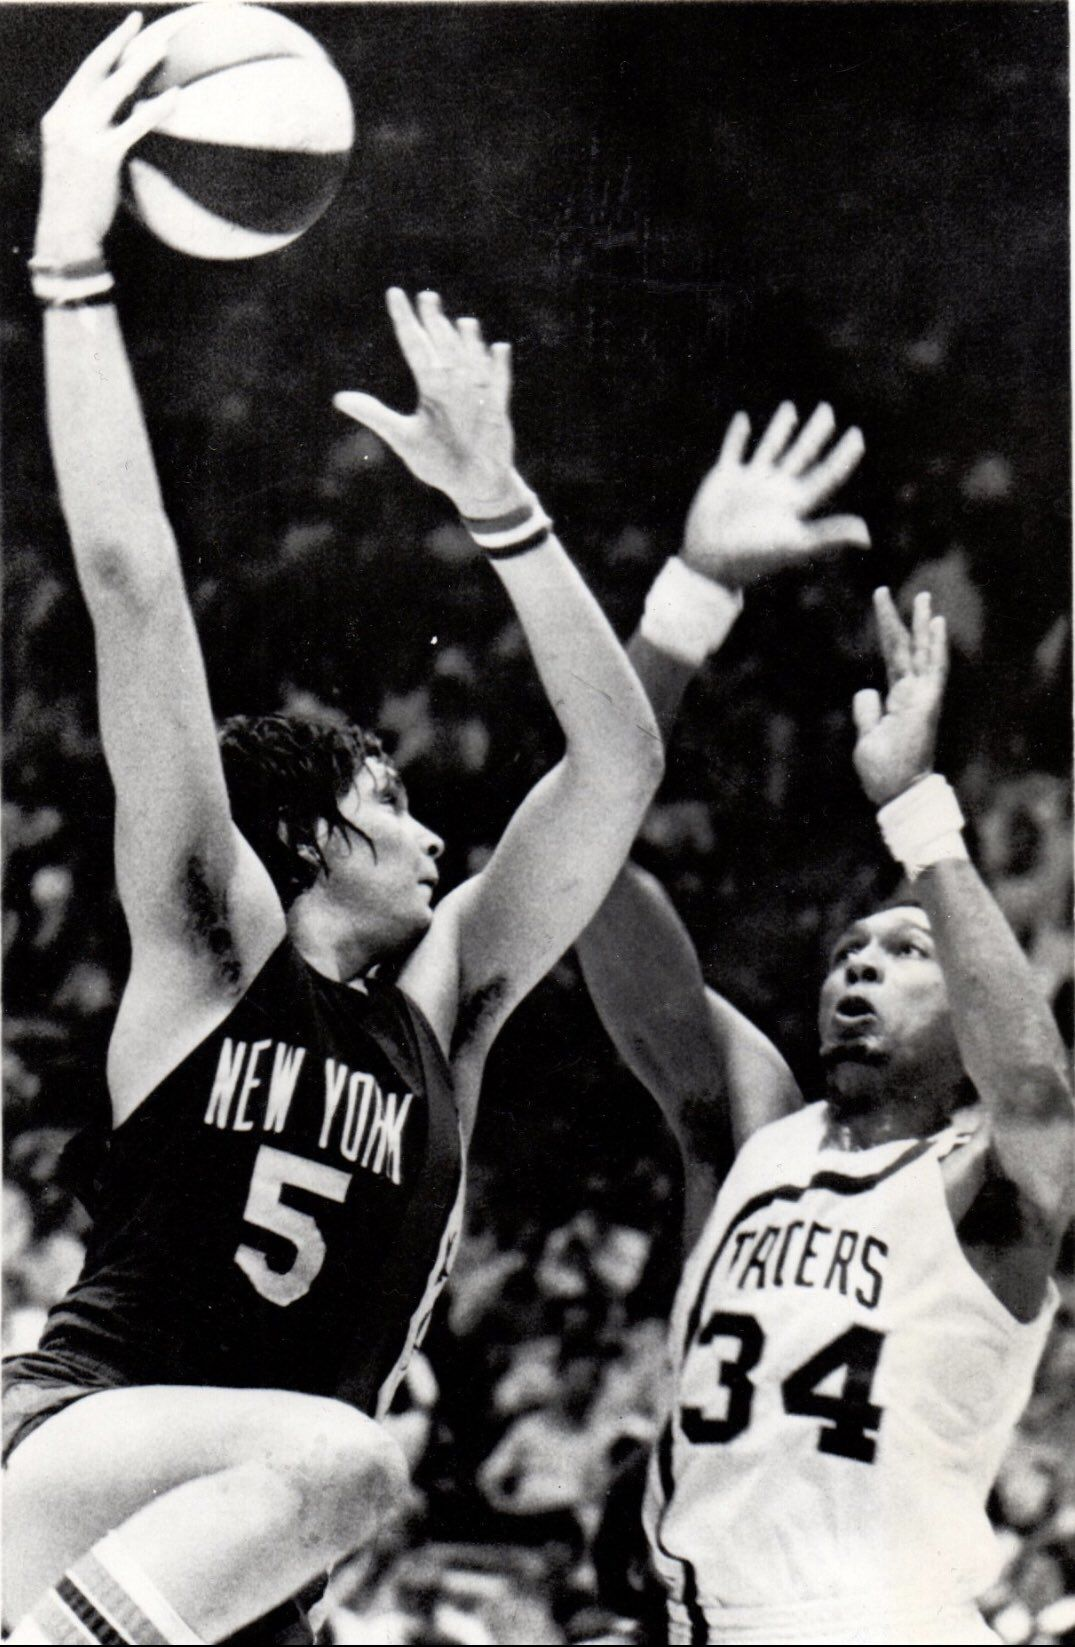 Pin by Rick on ABA Basketball association, Basketball